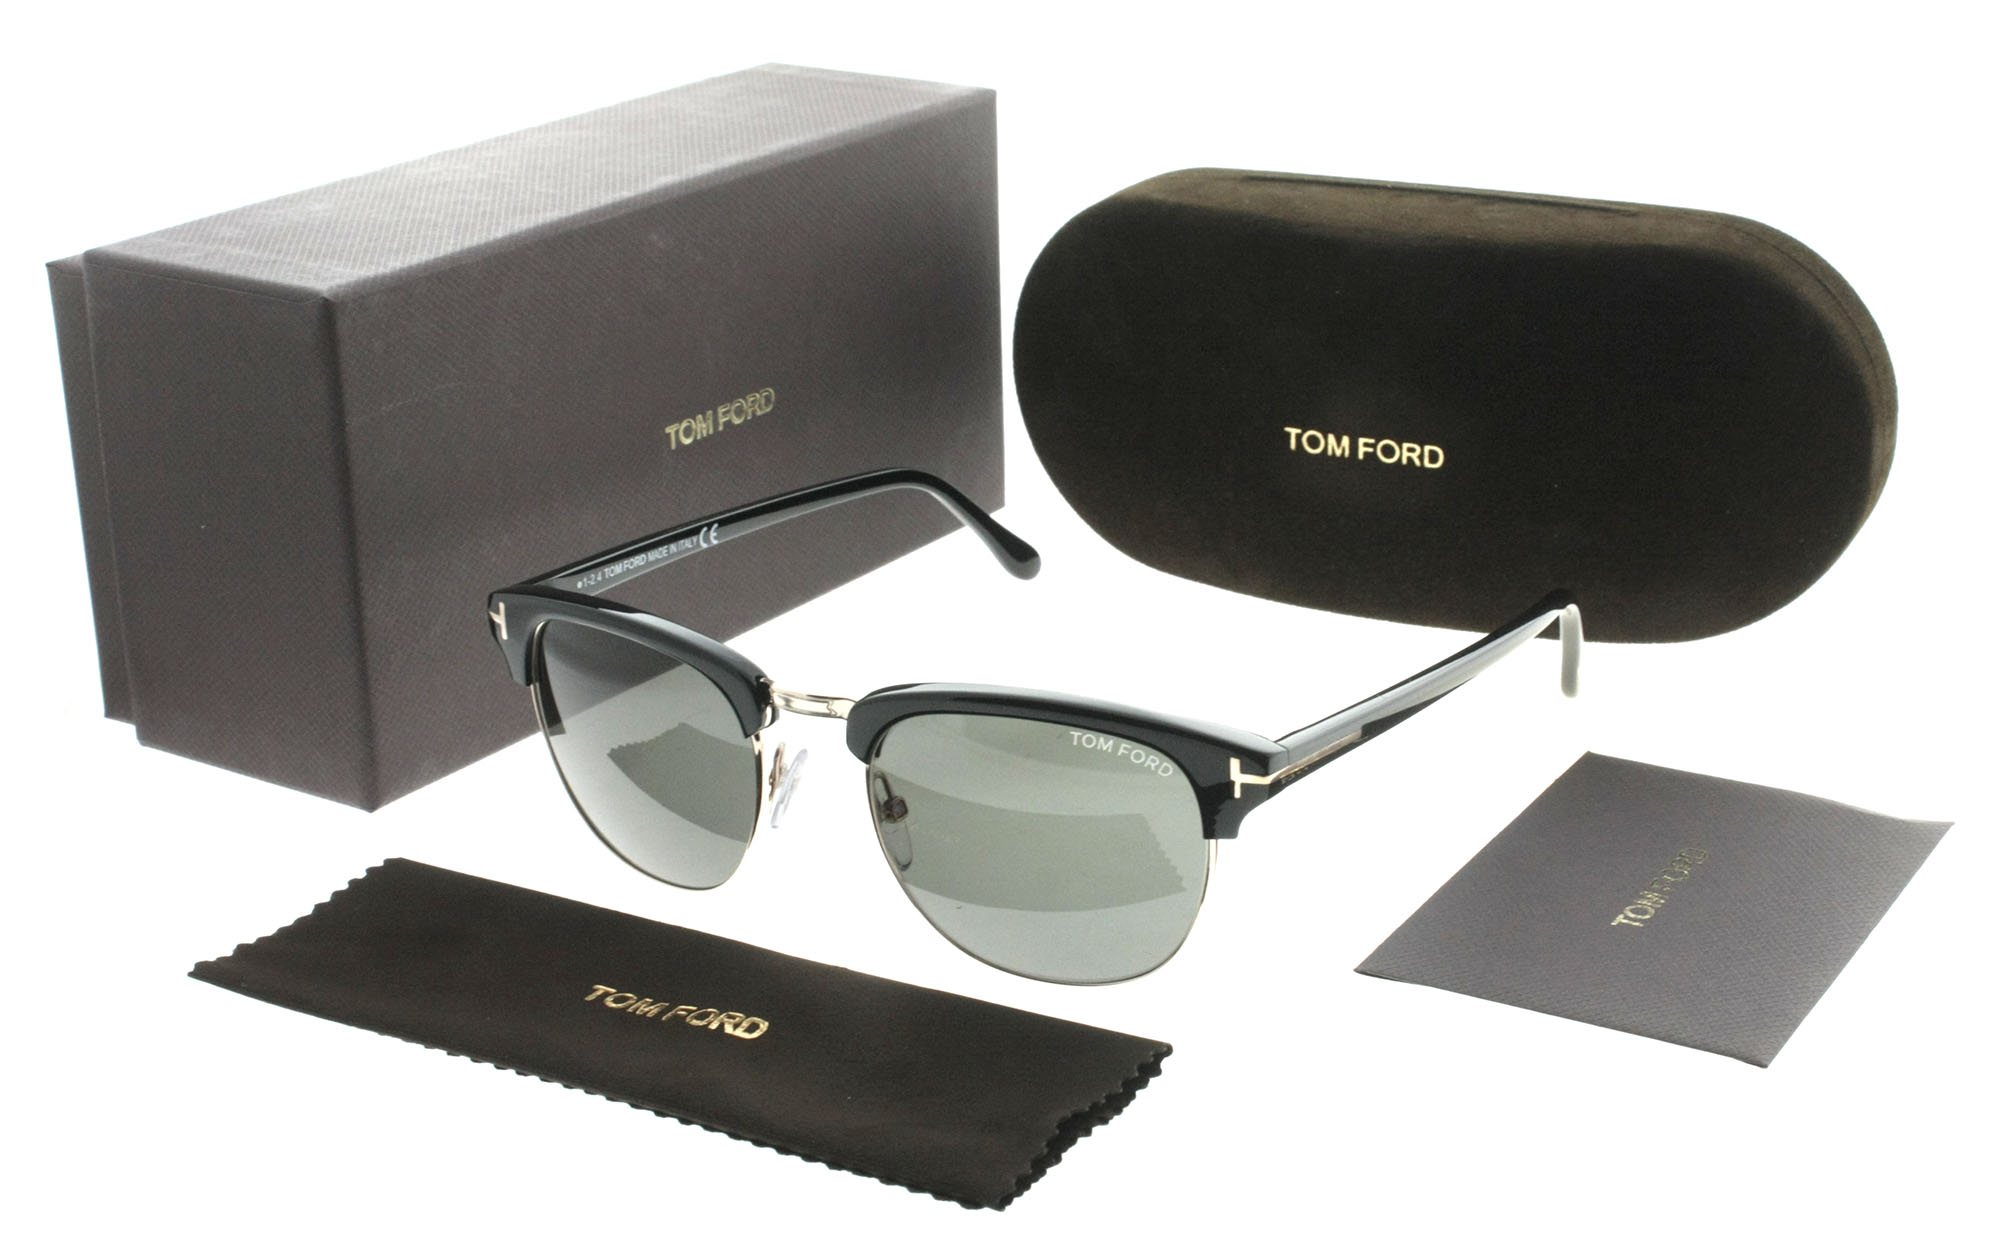 8b879270c0 Tom Ford Henry Sunglasses Amazon